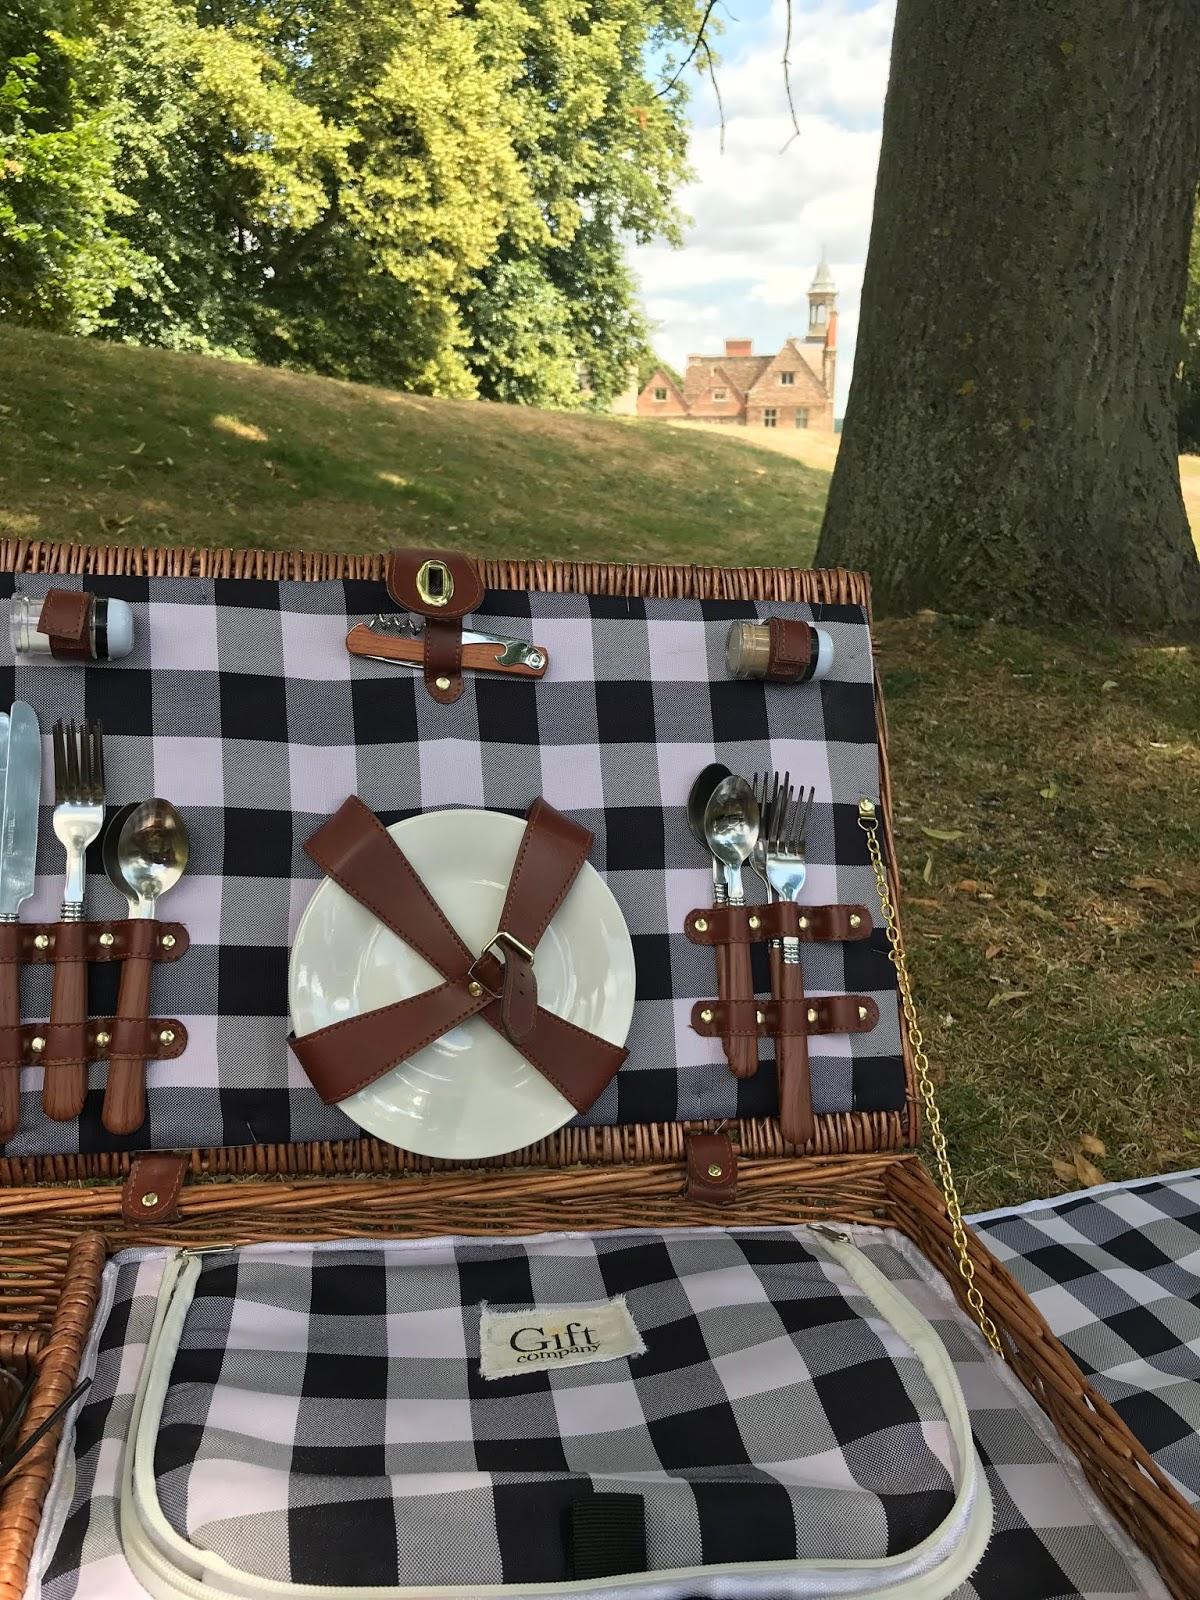 Picnic at Rufford Abbey \ The Gift company picnic basket